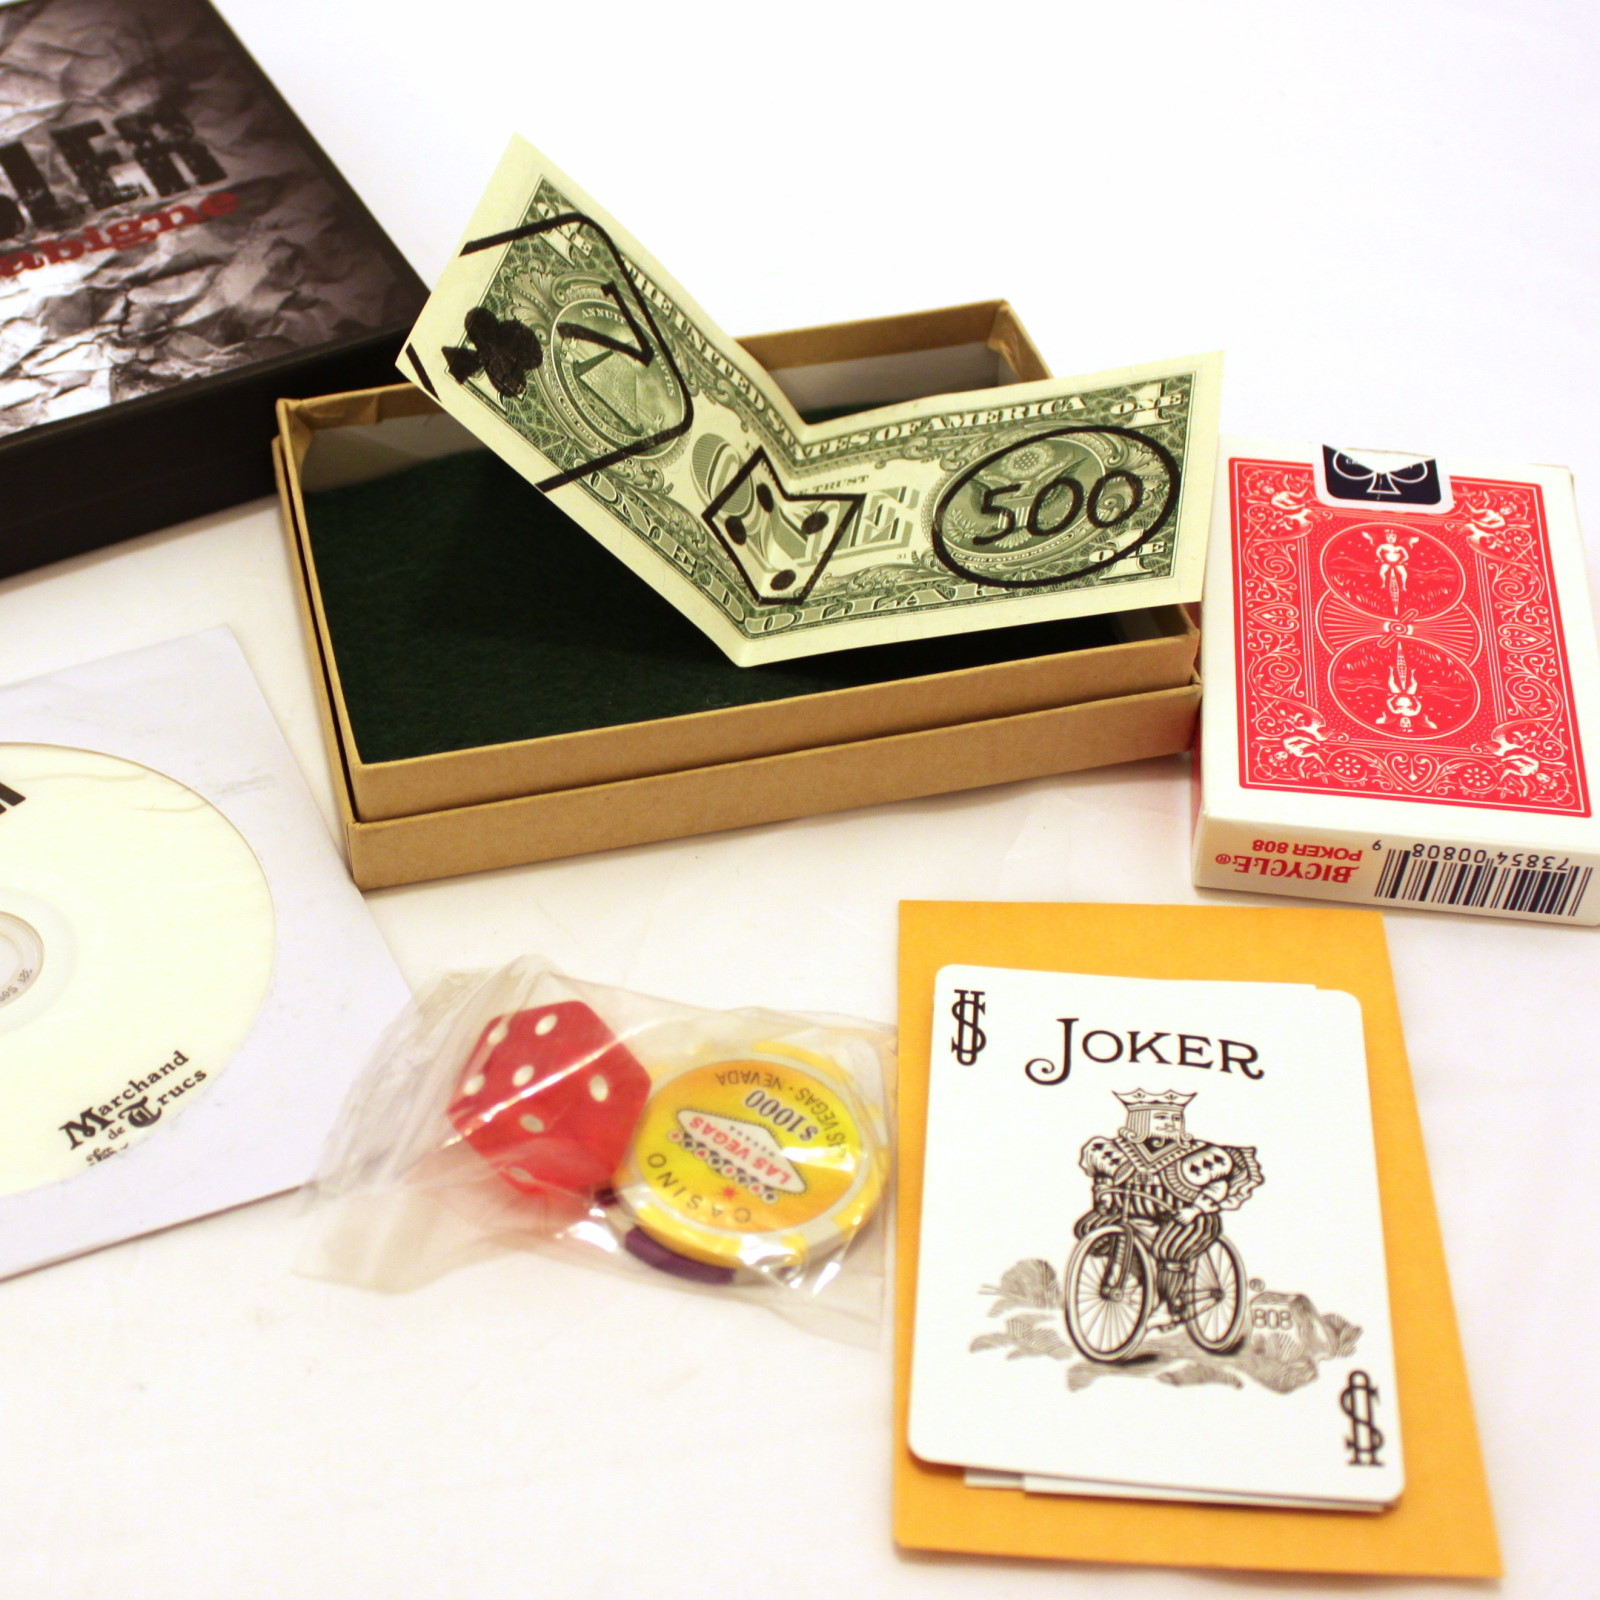 Gambler by Julien Labigne